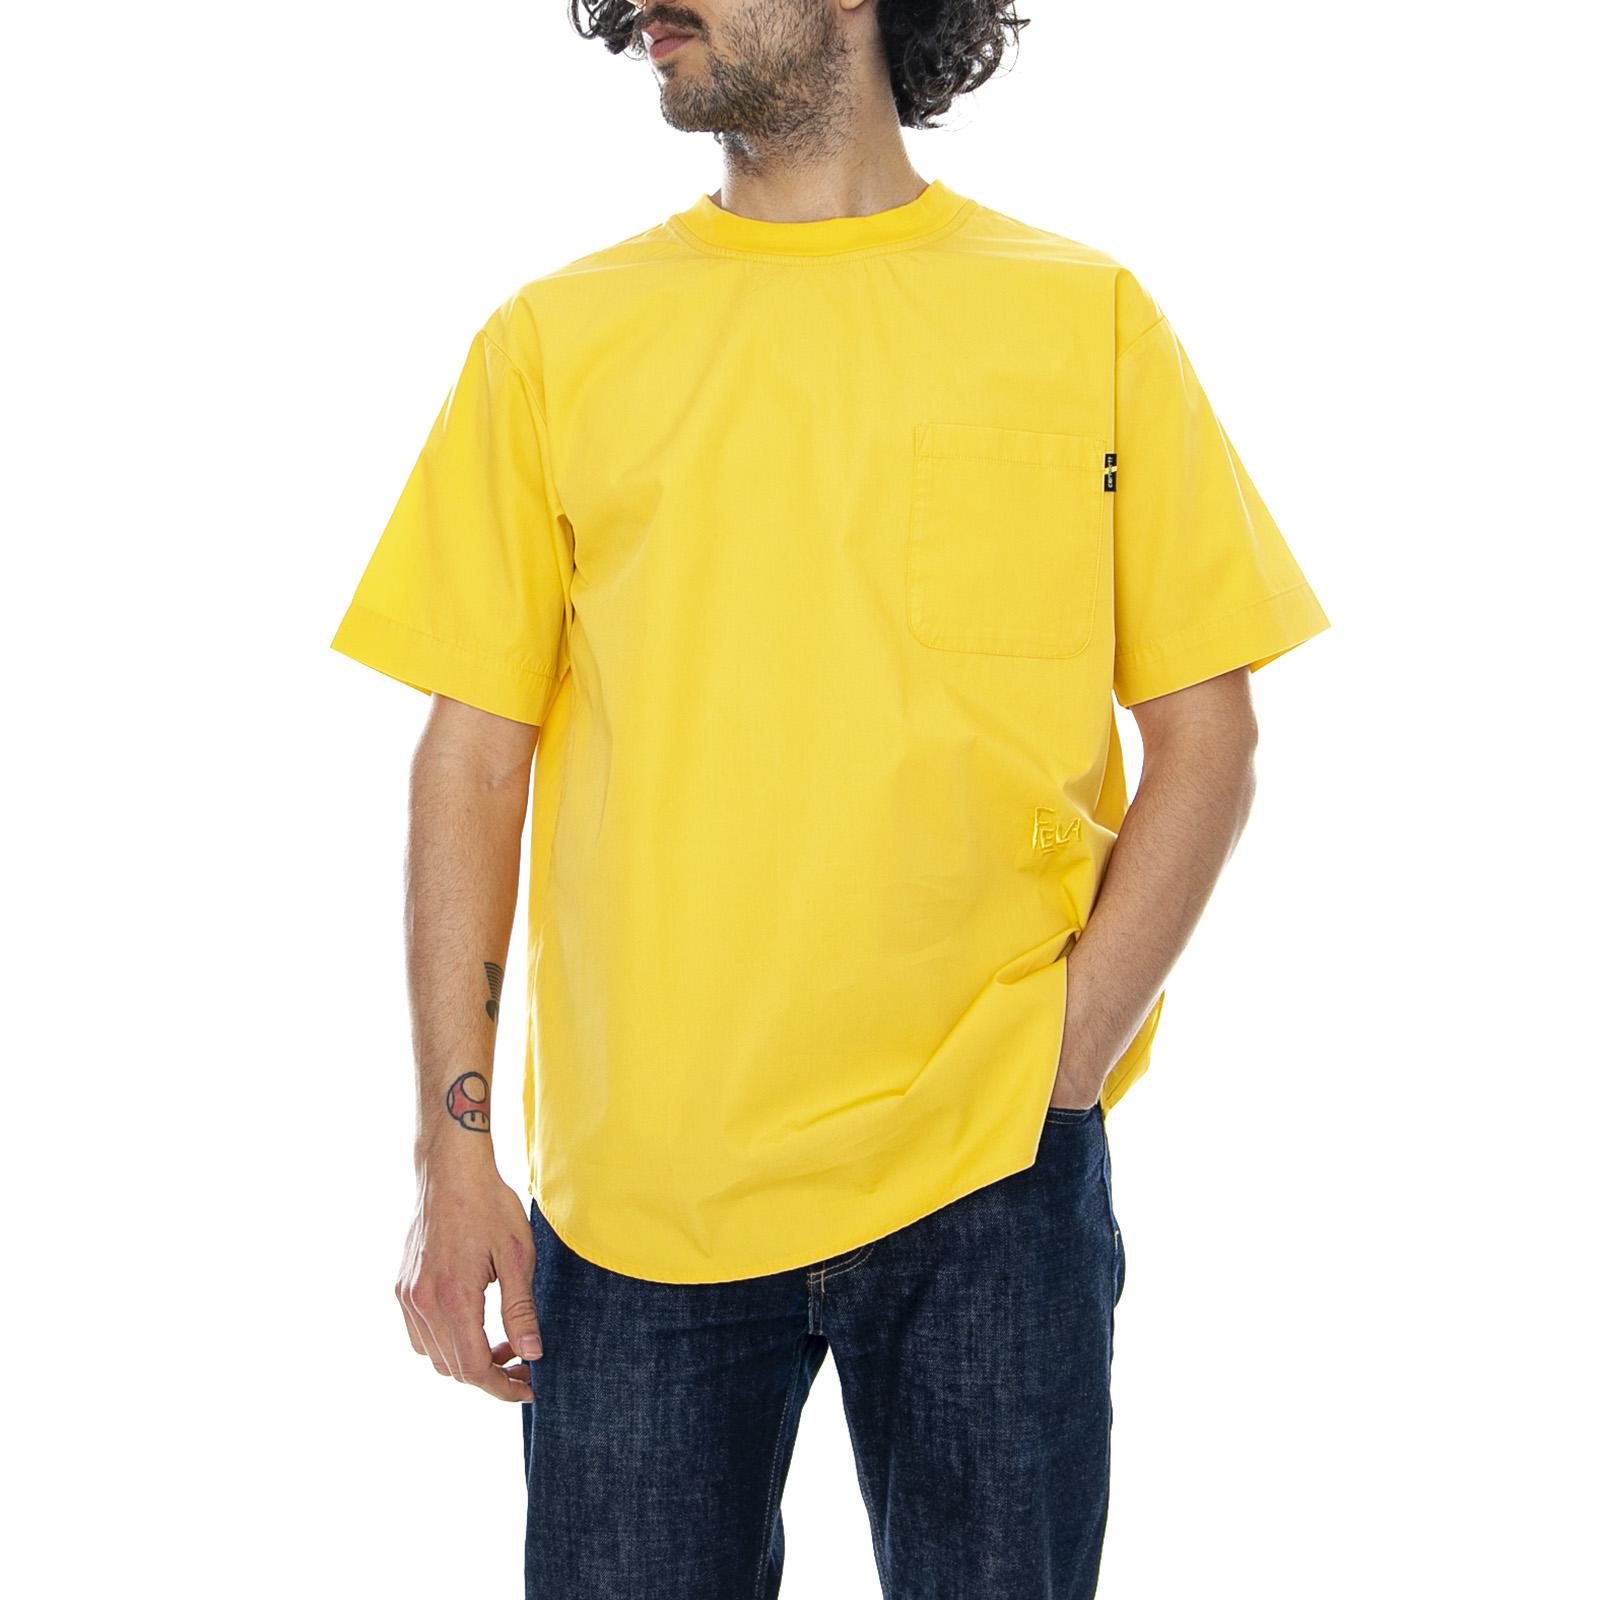 Cochehartt Fela Kuti -  Samoan Sol Amarillo - Camiseta Cuello rojoondo Hombre  tomar hasta un 70% de descuento